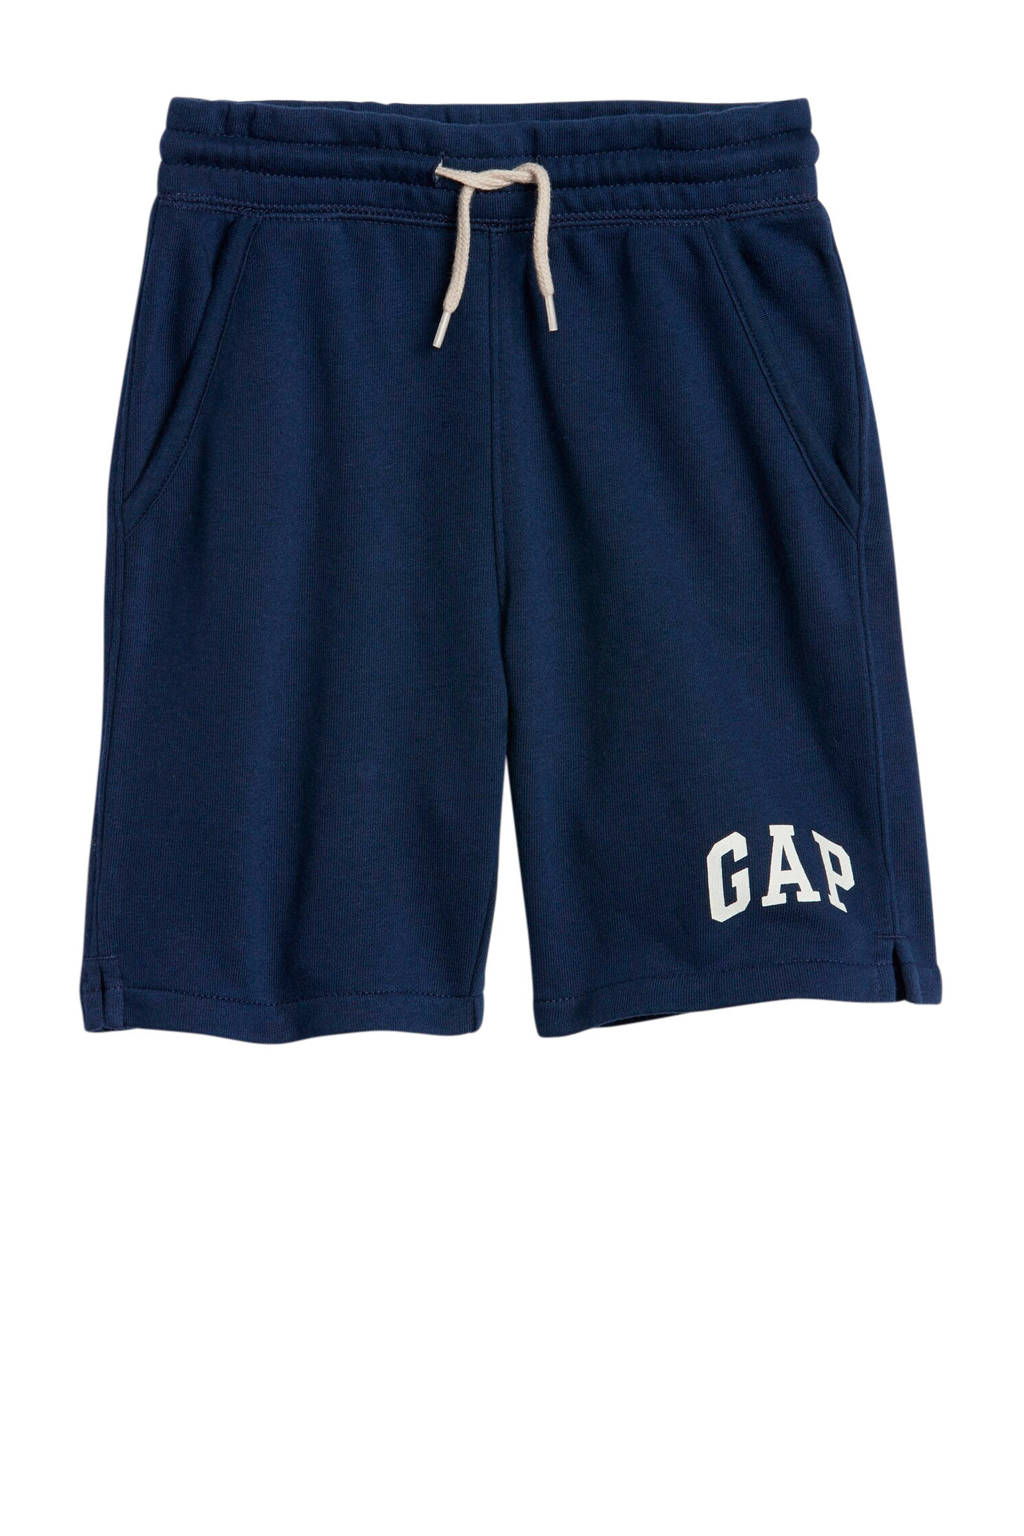 GAP sweatshort met logo donkerblauw, Donkerblauw